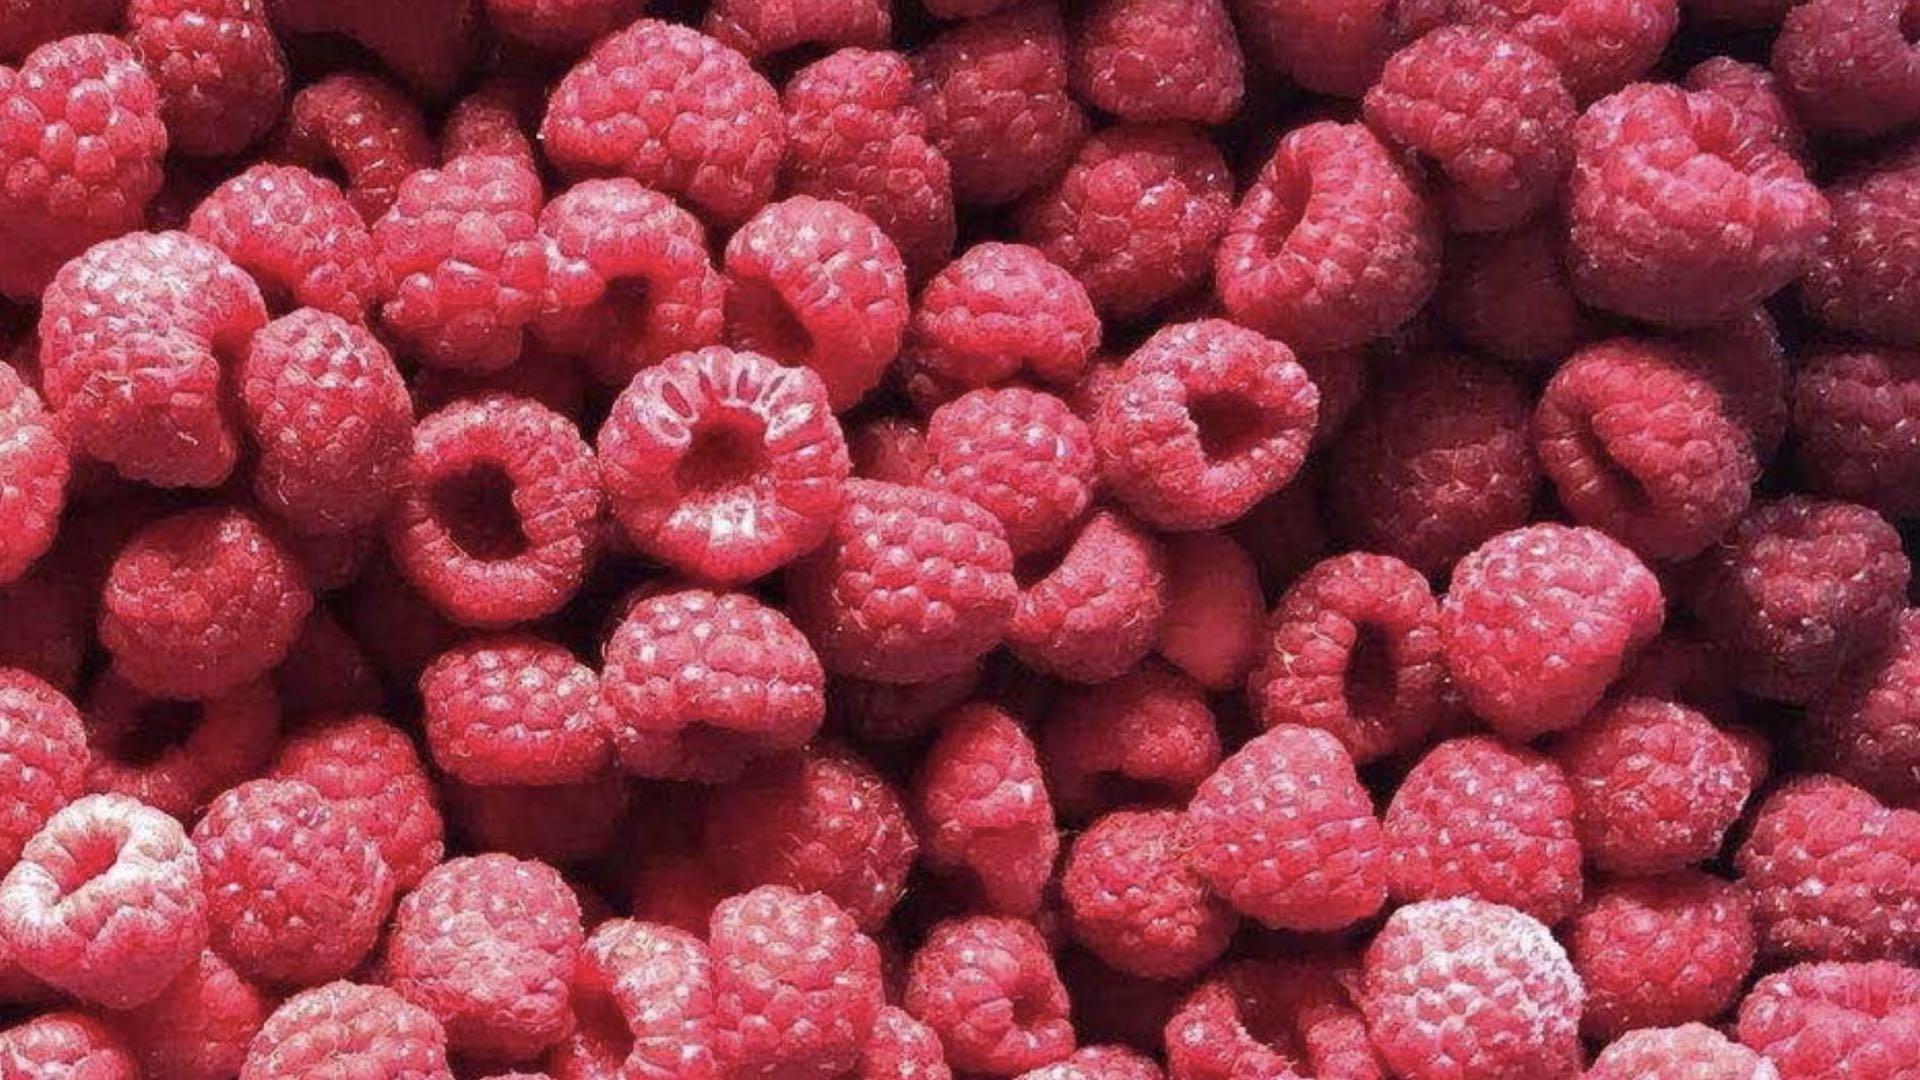 IQF Raspberries,Frozen Raspberry,wholes/brokens/crumbles/puree 2